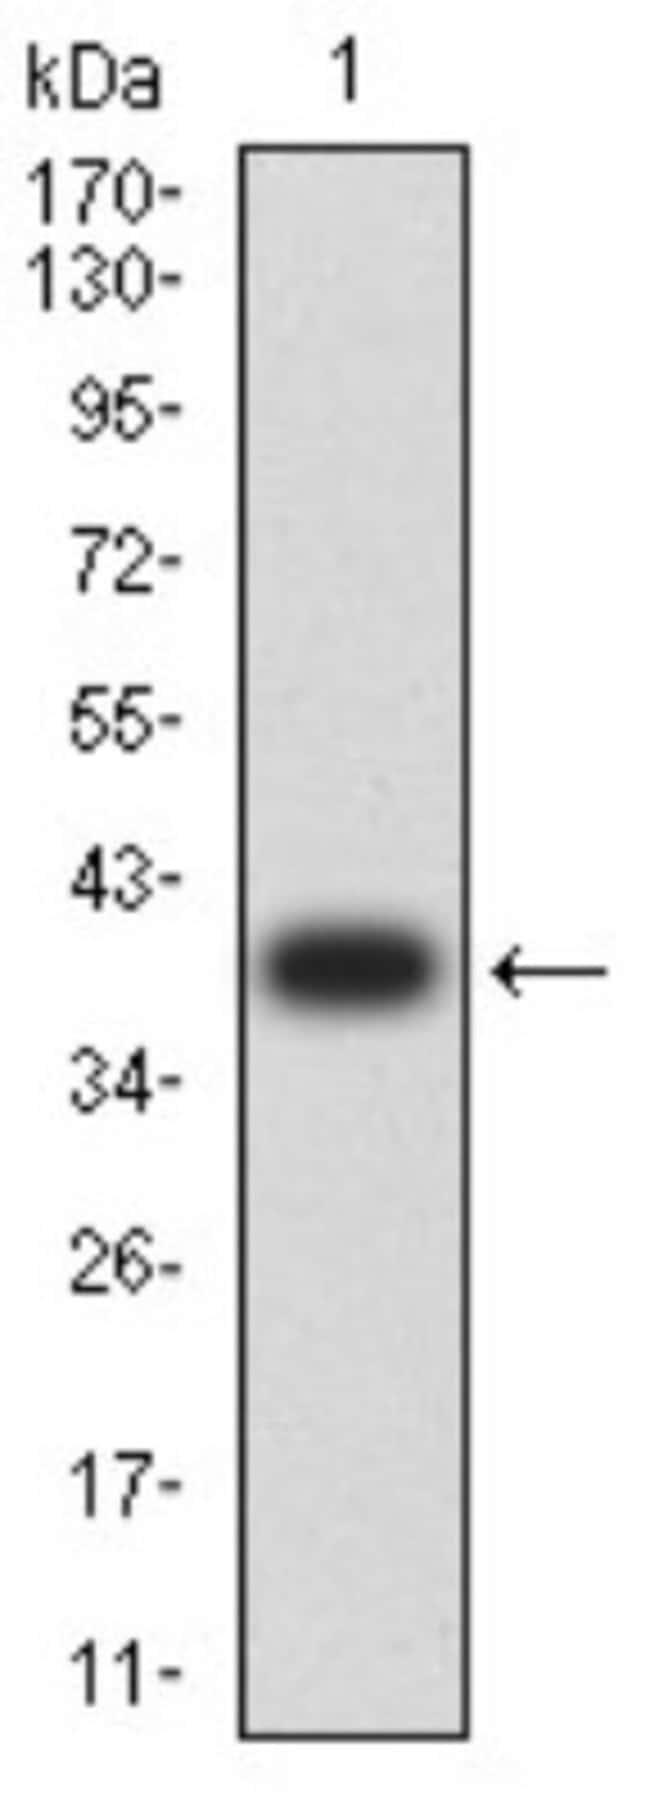 AP-2 beta/TFAP2B Mouse anti-Human, Clone: 6F7G1, Novus Biologicals 0.1